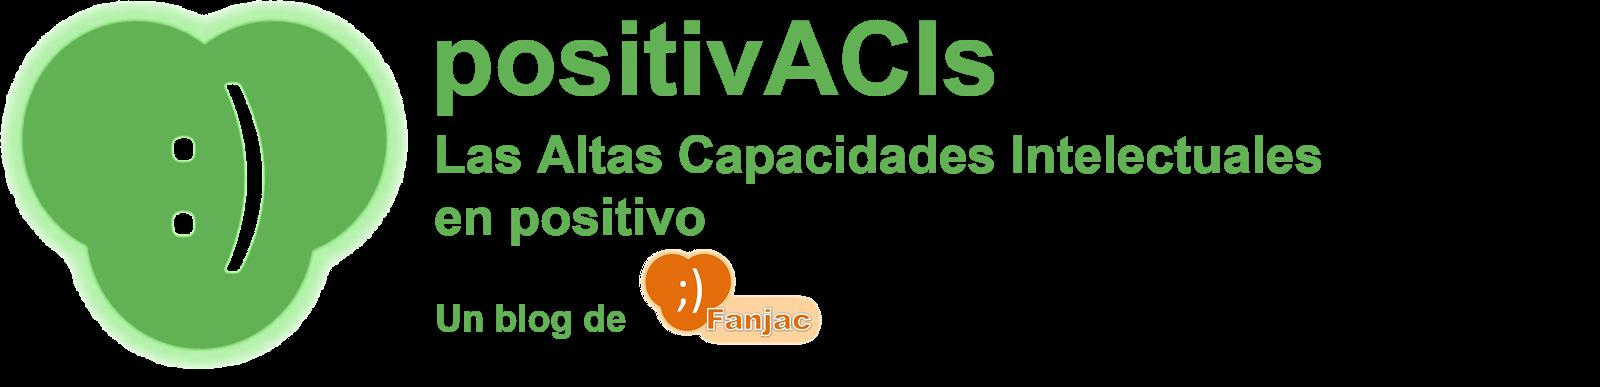 positivACIs